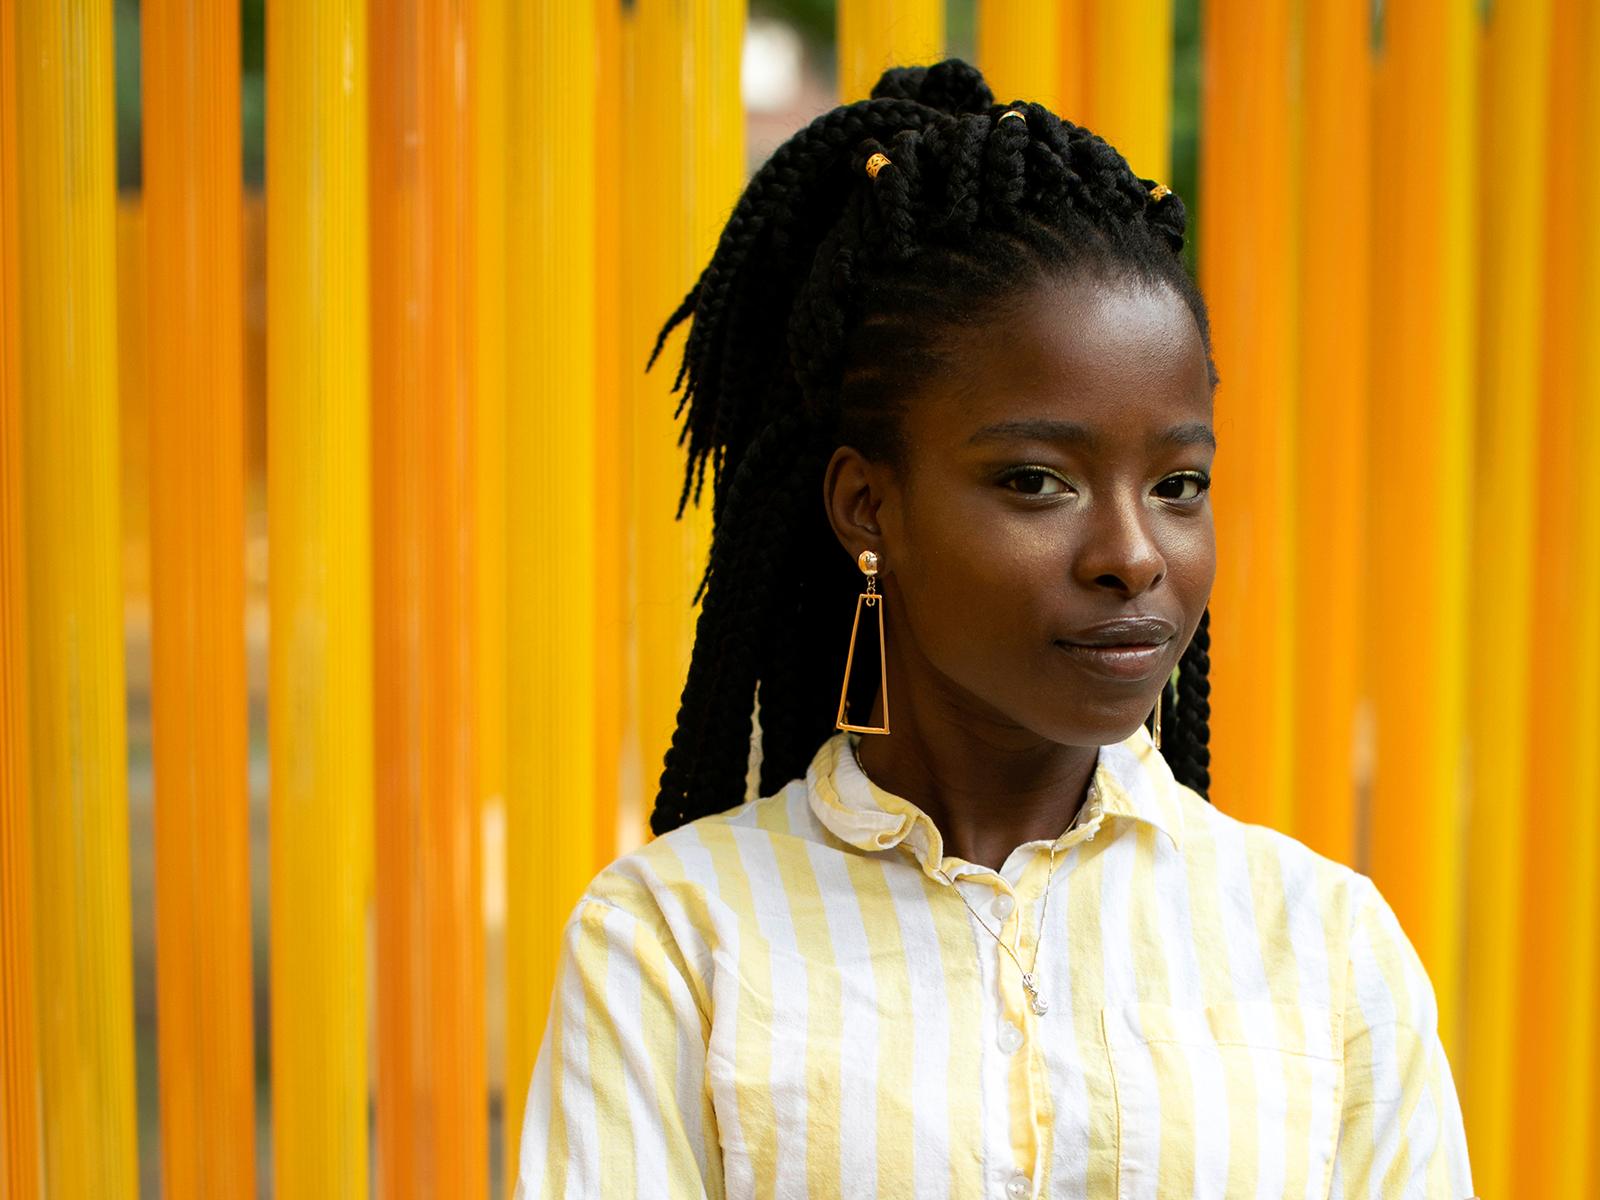 When a Black woman speaks, the world listens